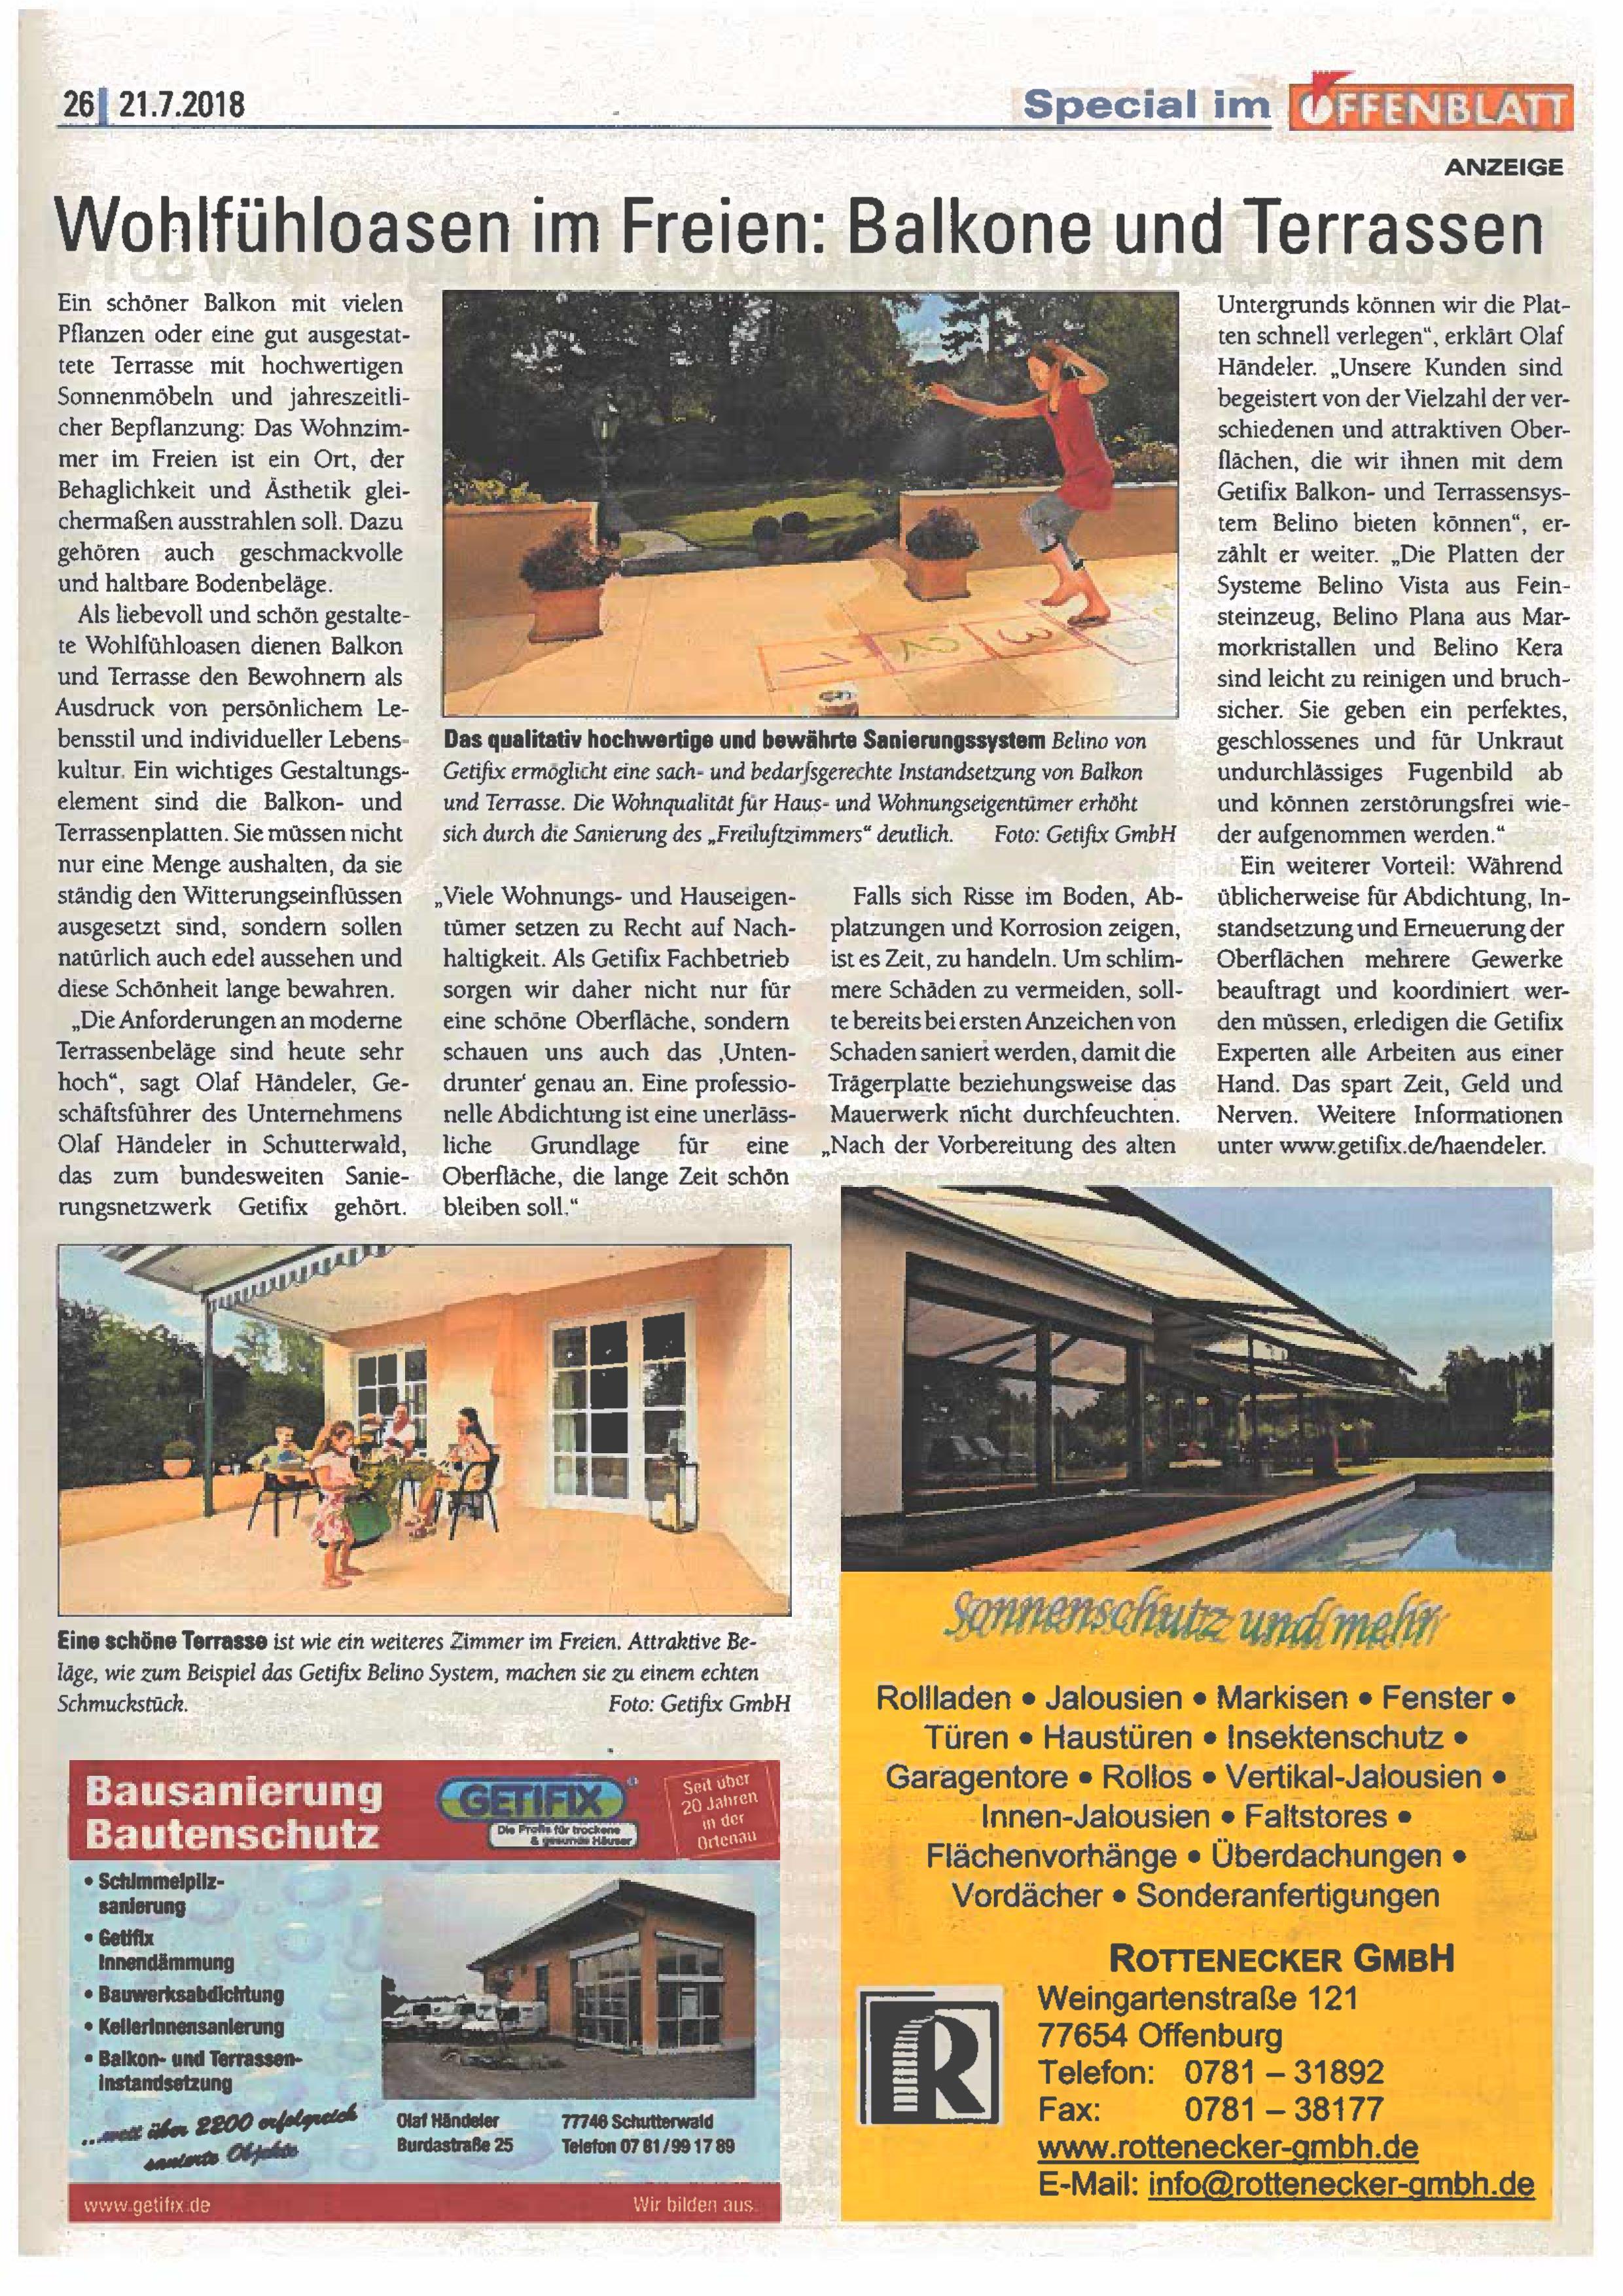 Offenblatt Juli 2018